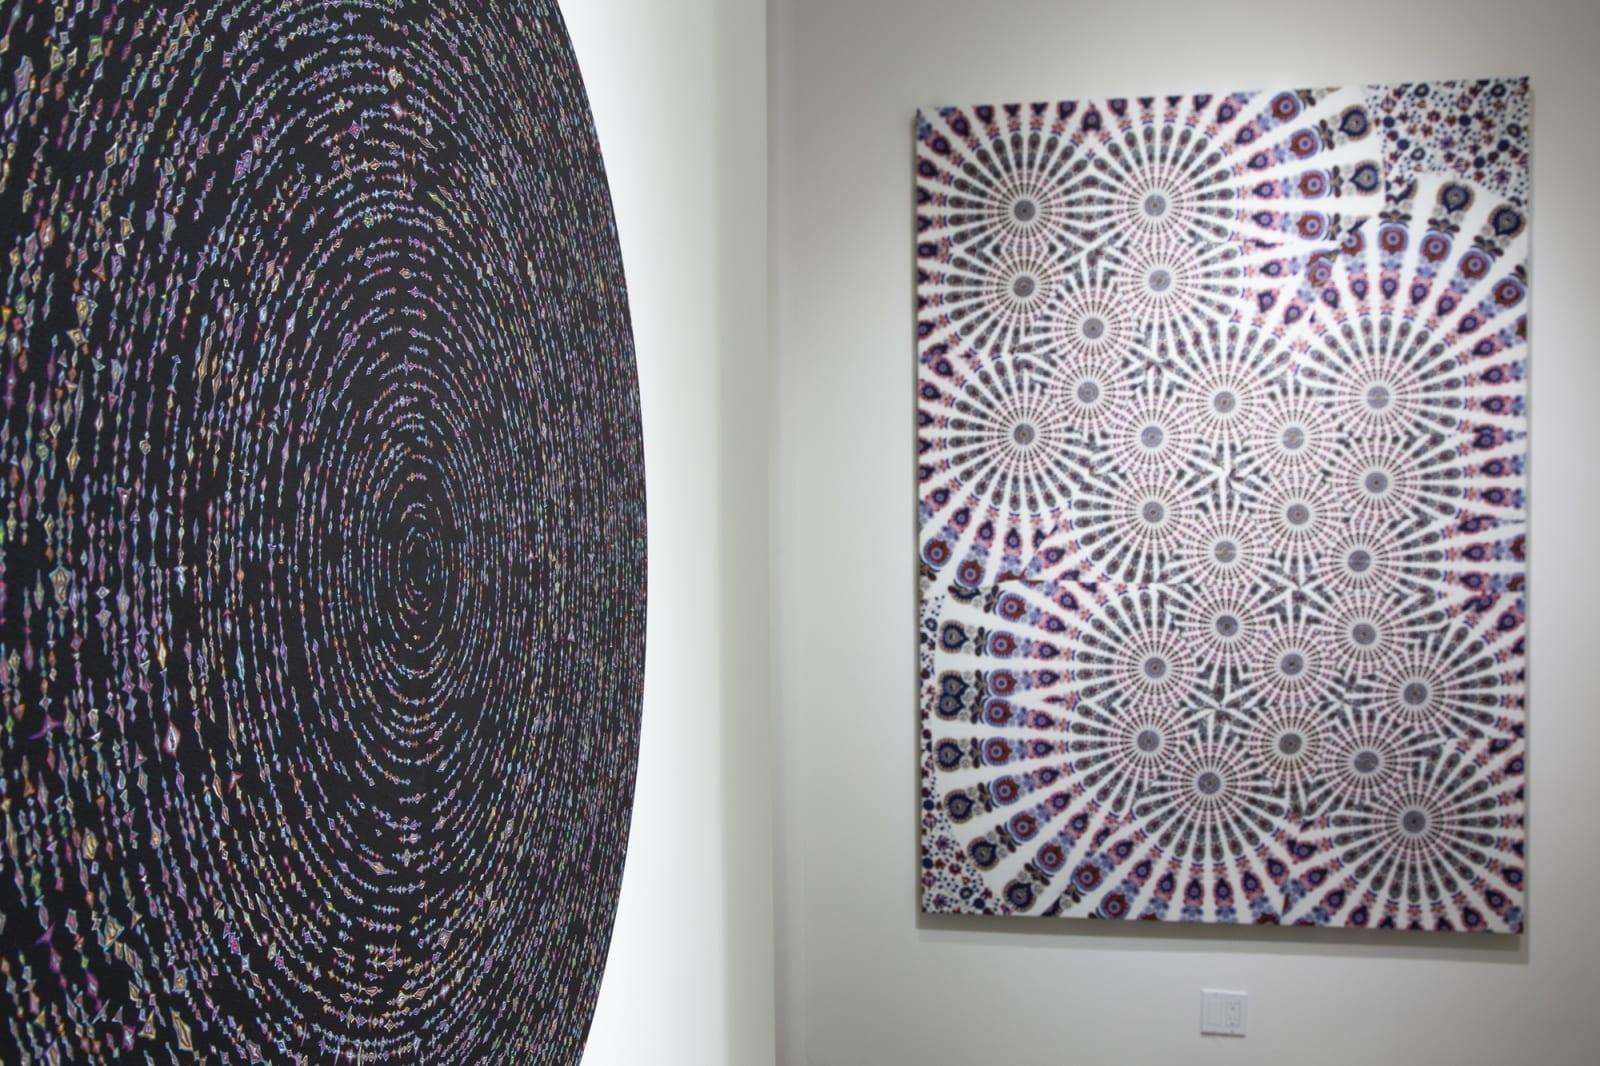 Kelsey Brookes | Perception & Hallucination